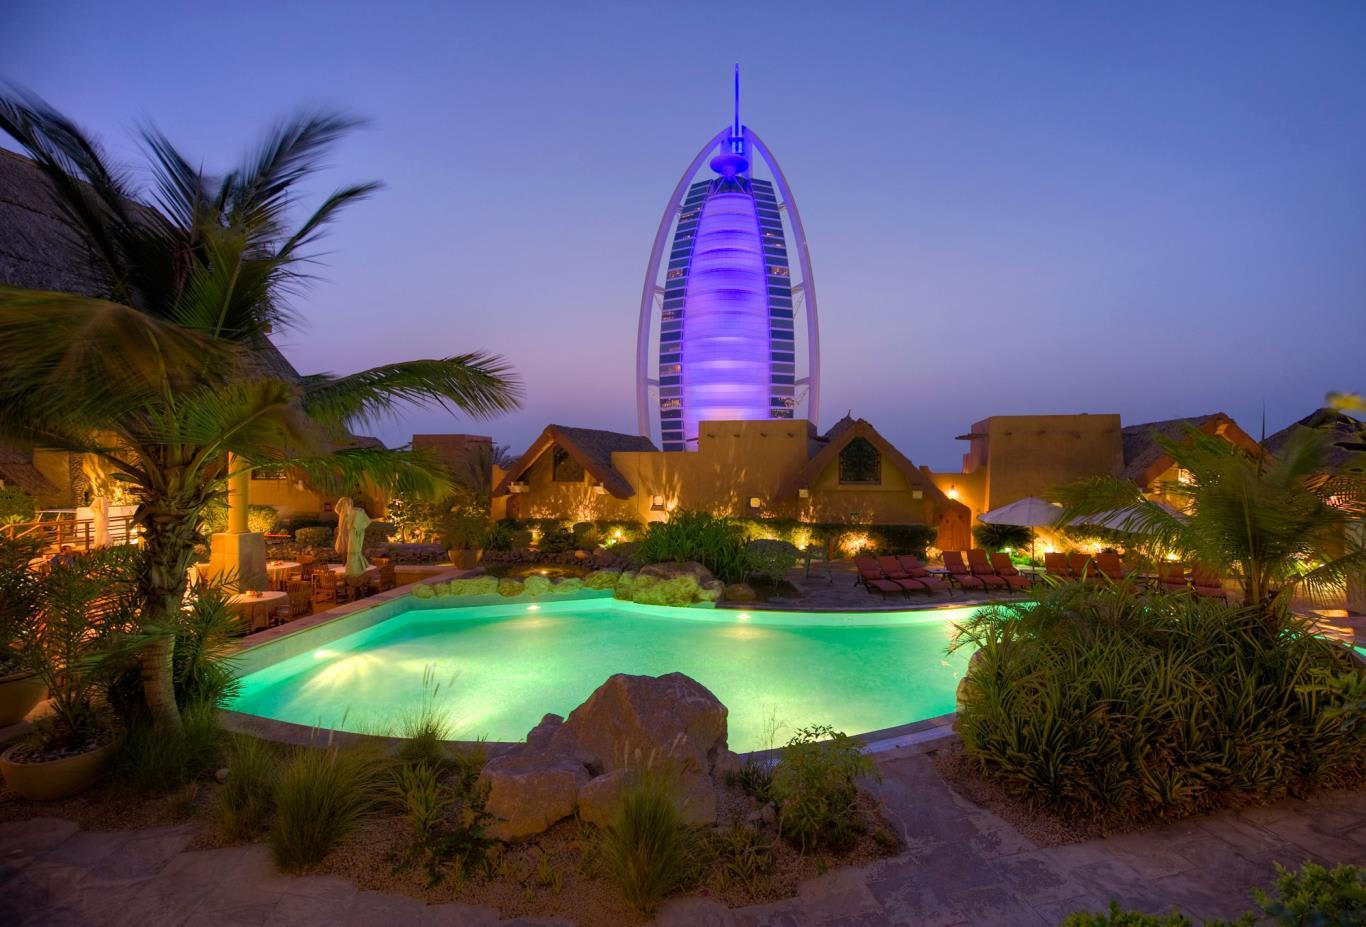 villas-pools-at-night